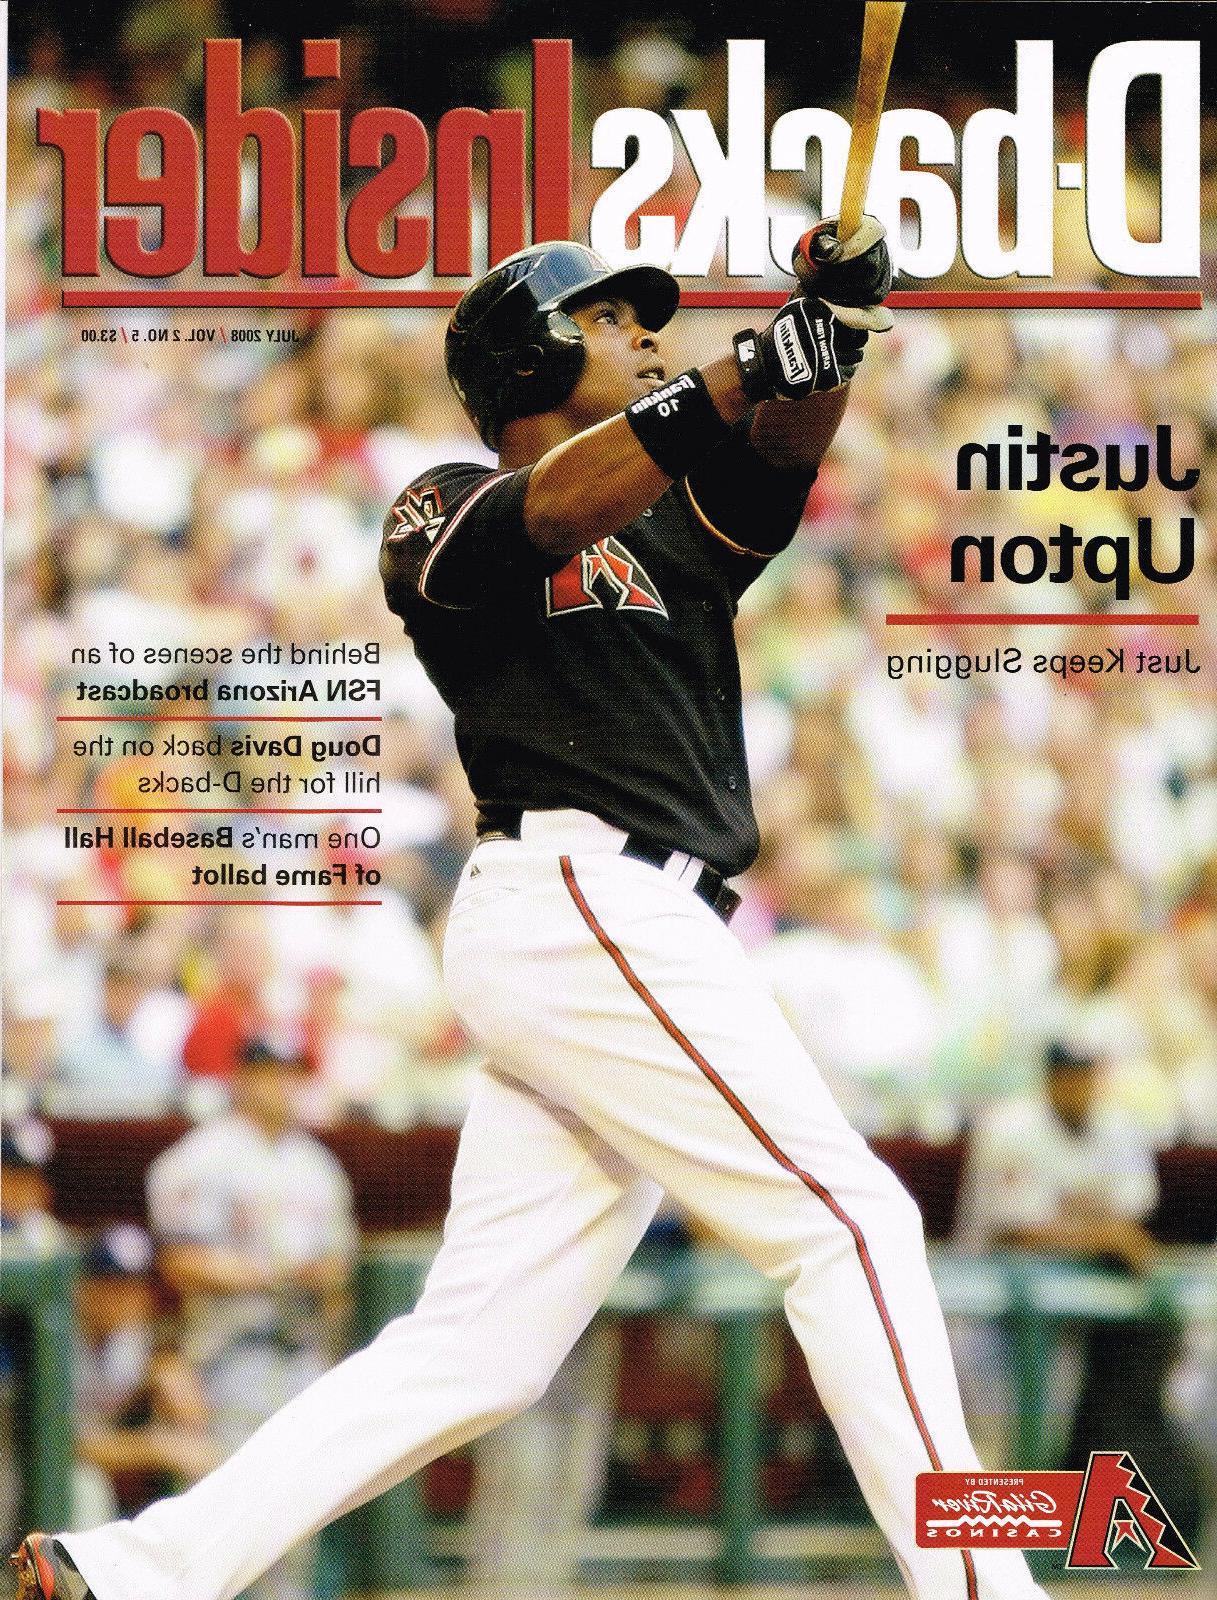 2008 Magazine - Choice